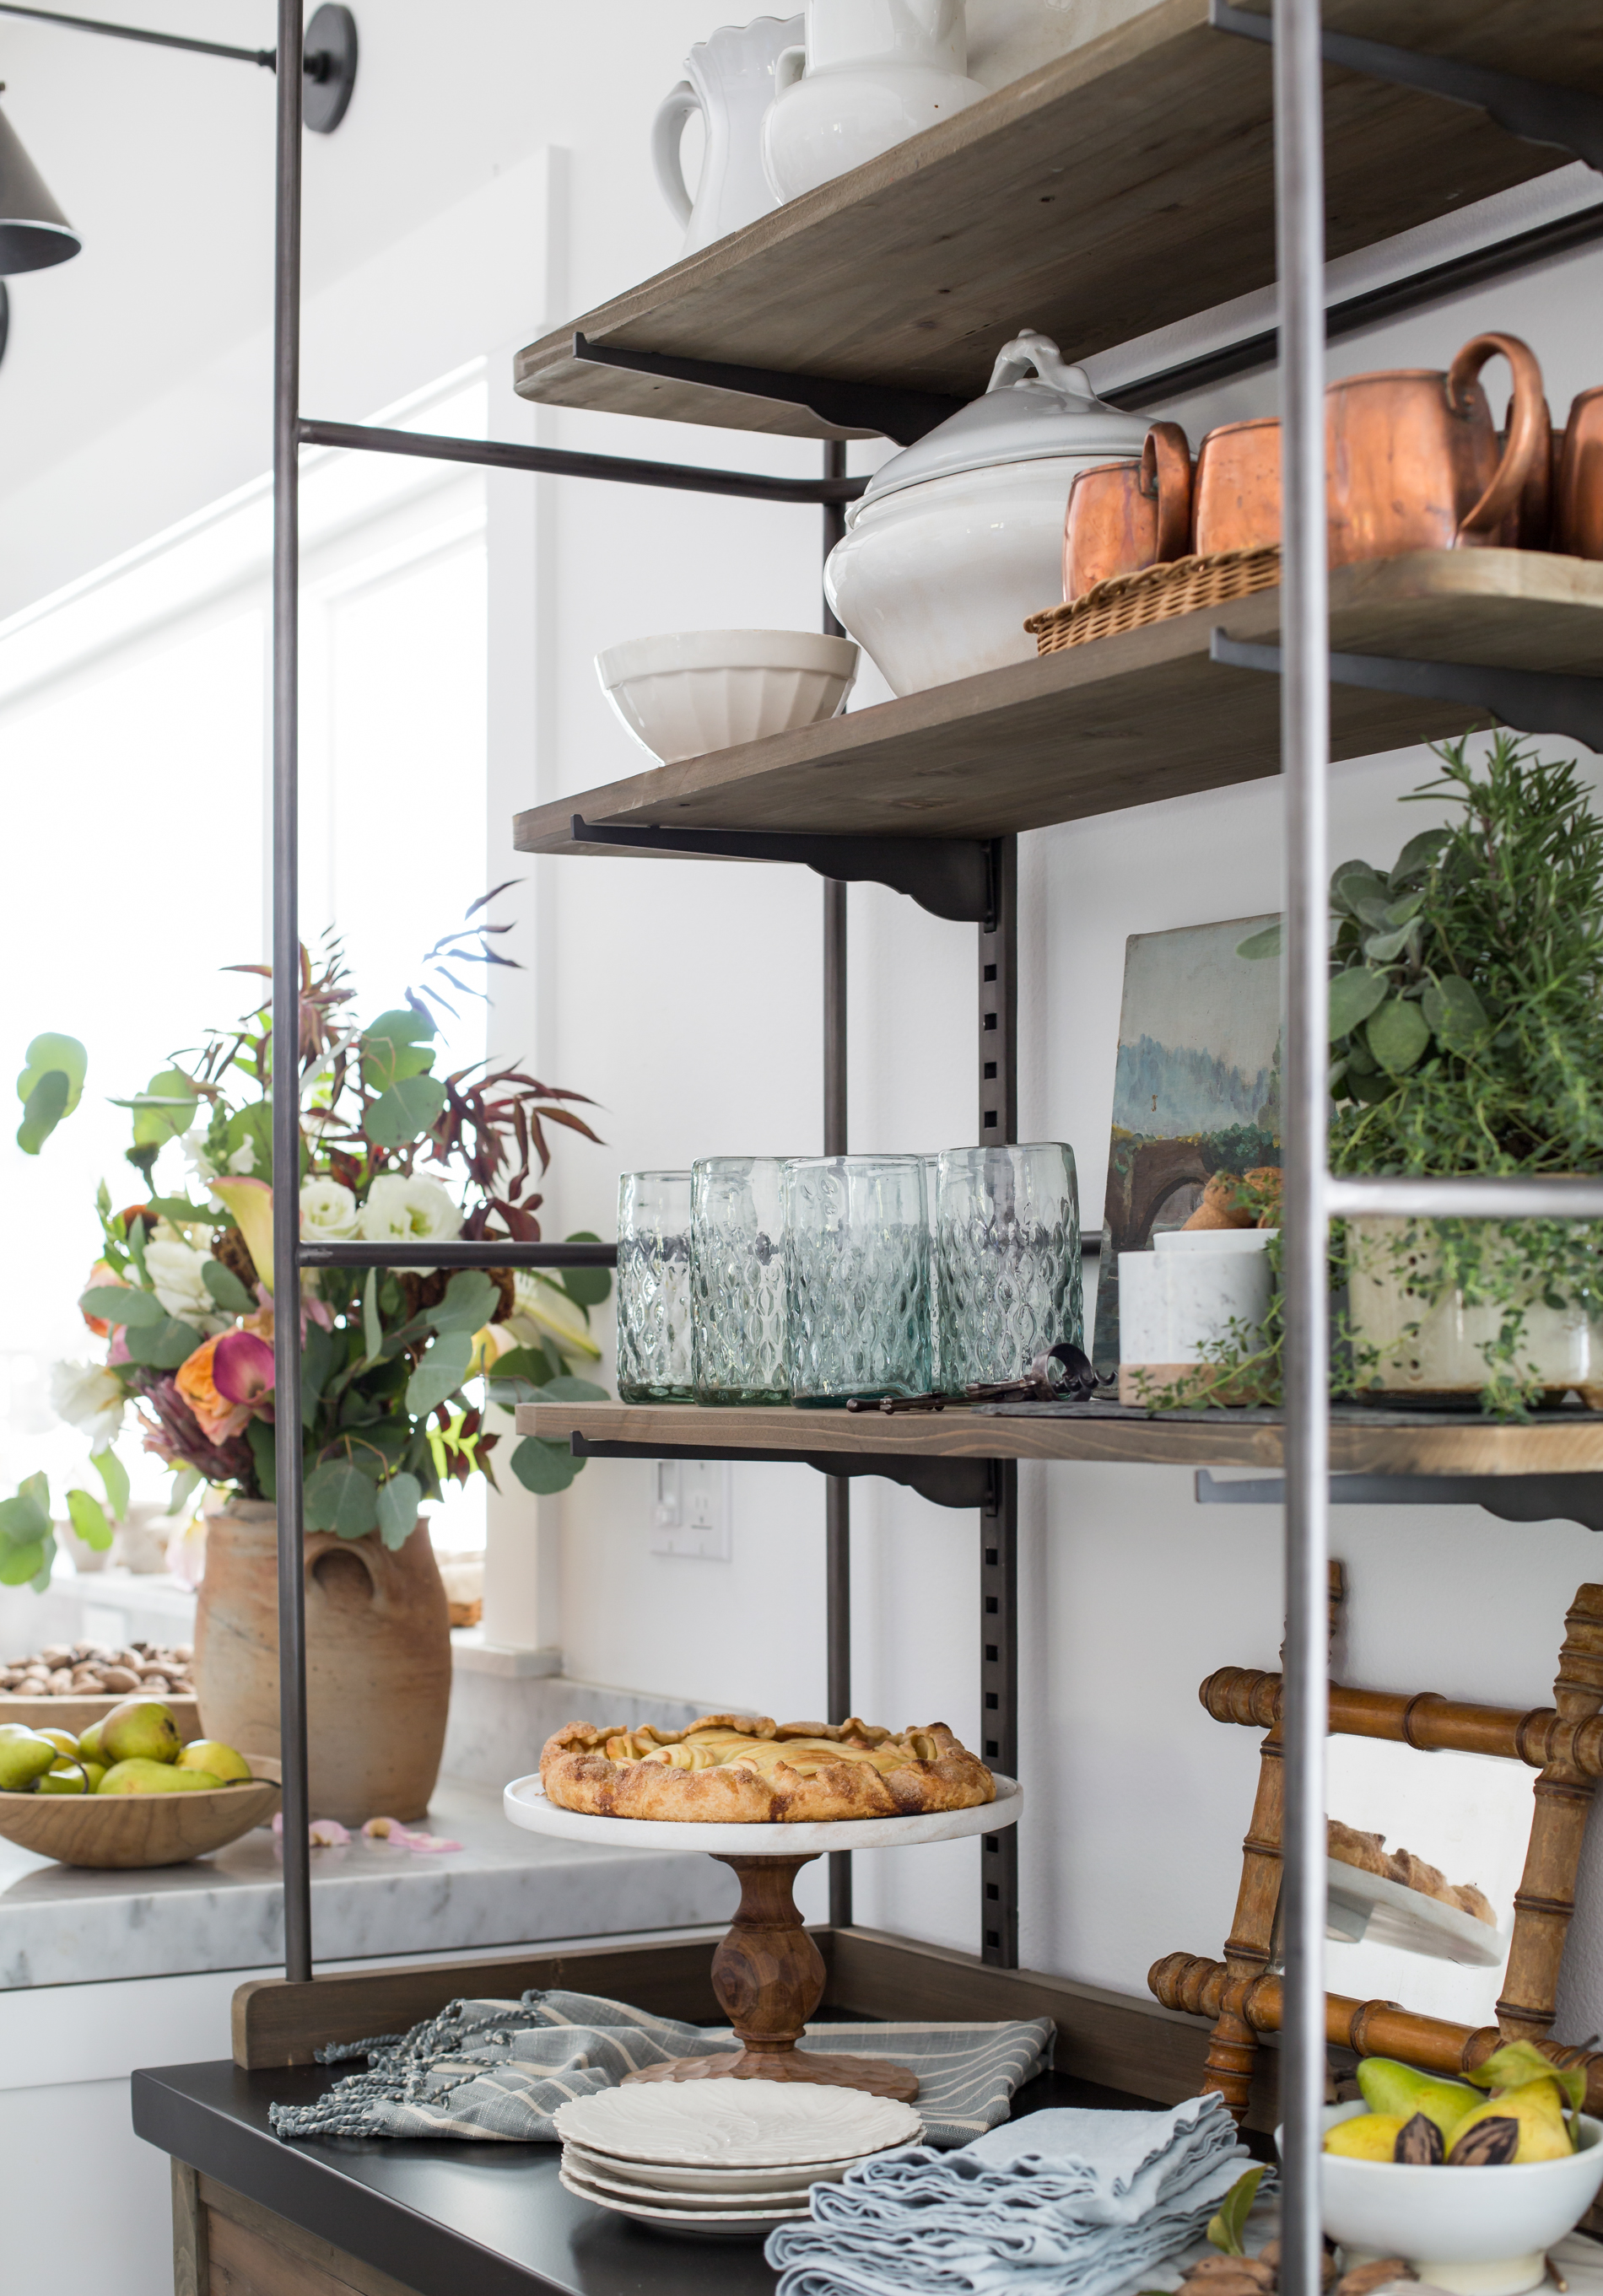 Heather Bullard | French Display Cabinet